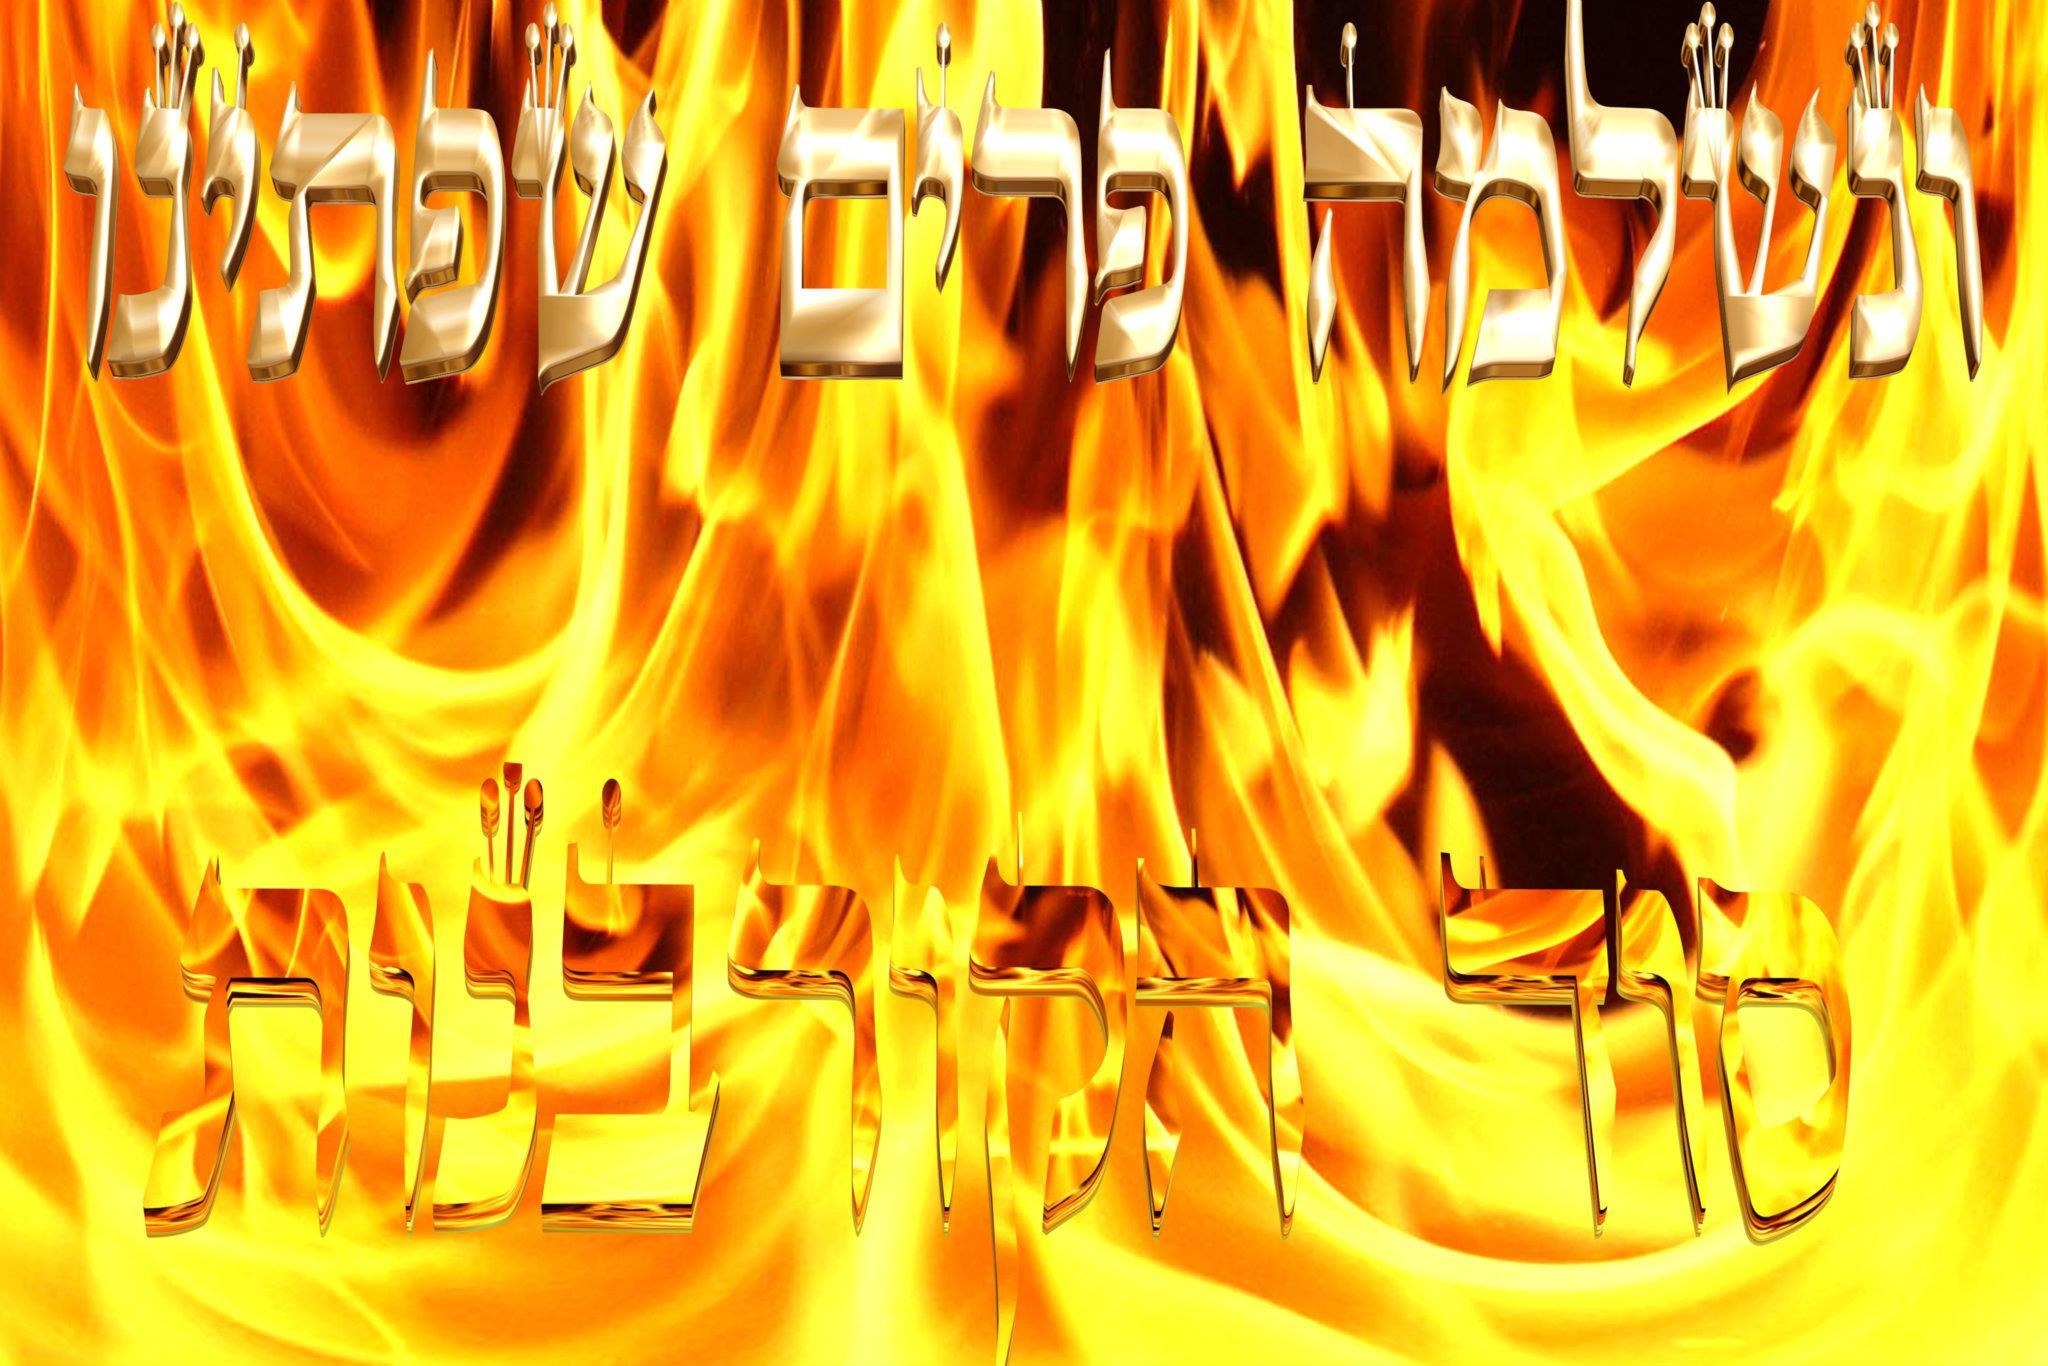 Parashat Vaykra (5776) - Yéhouda Moshé Charbit